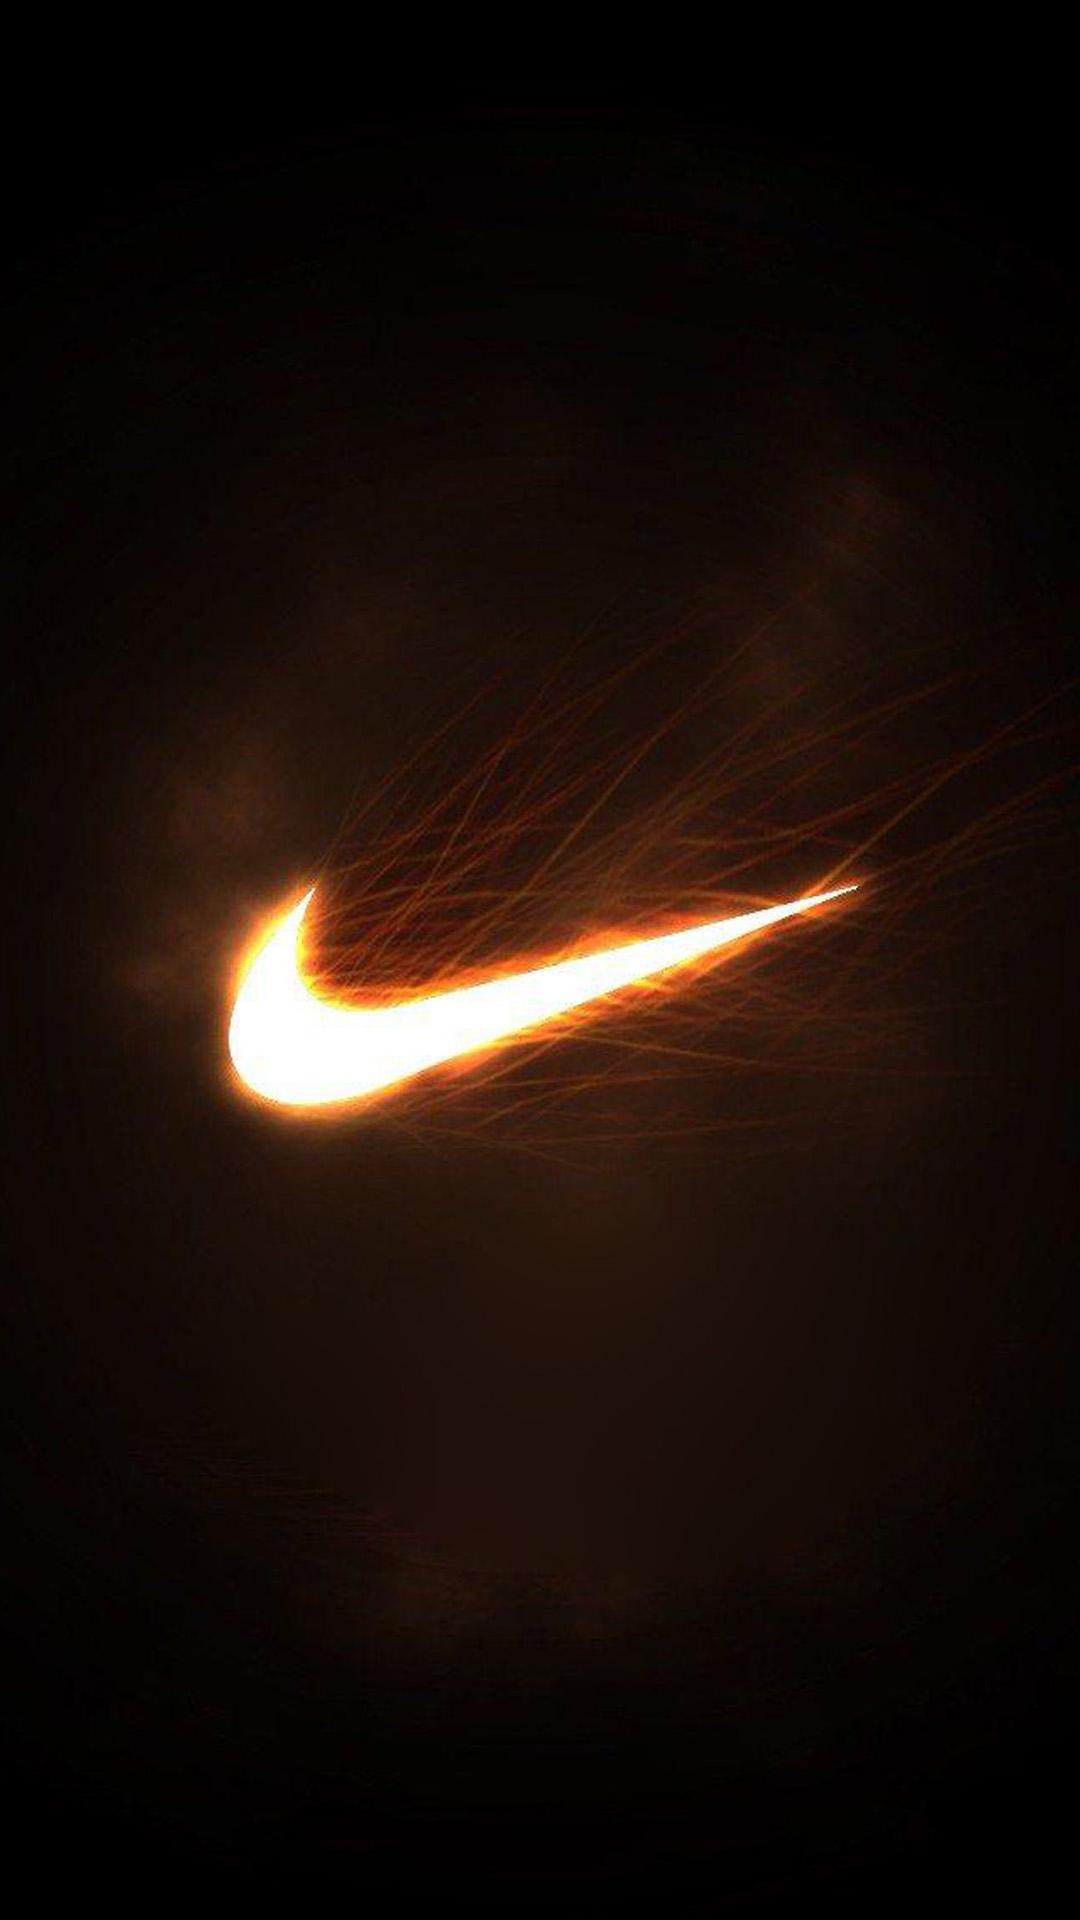 Unduh 72 Wallpaper Iphone Nike Hd Terbaik